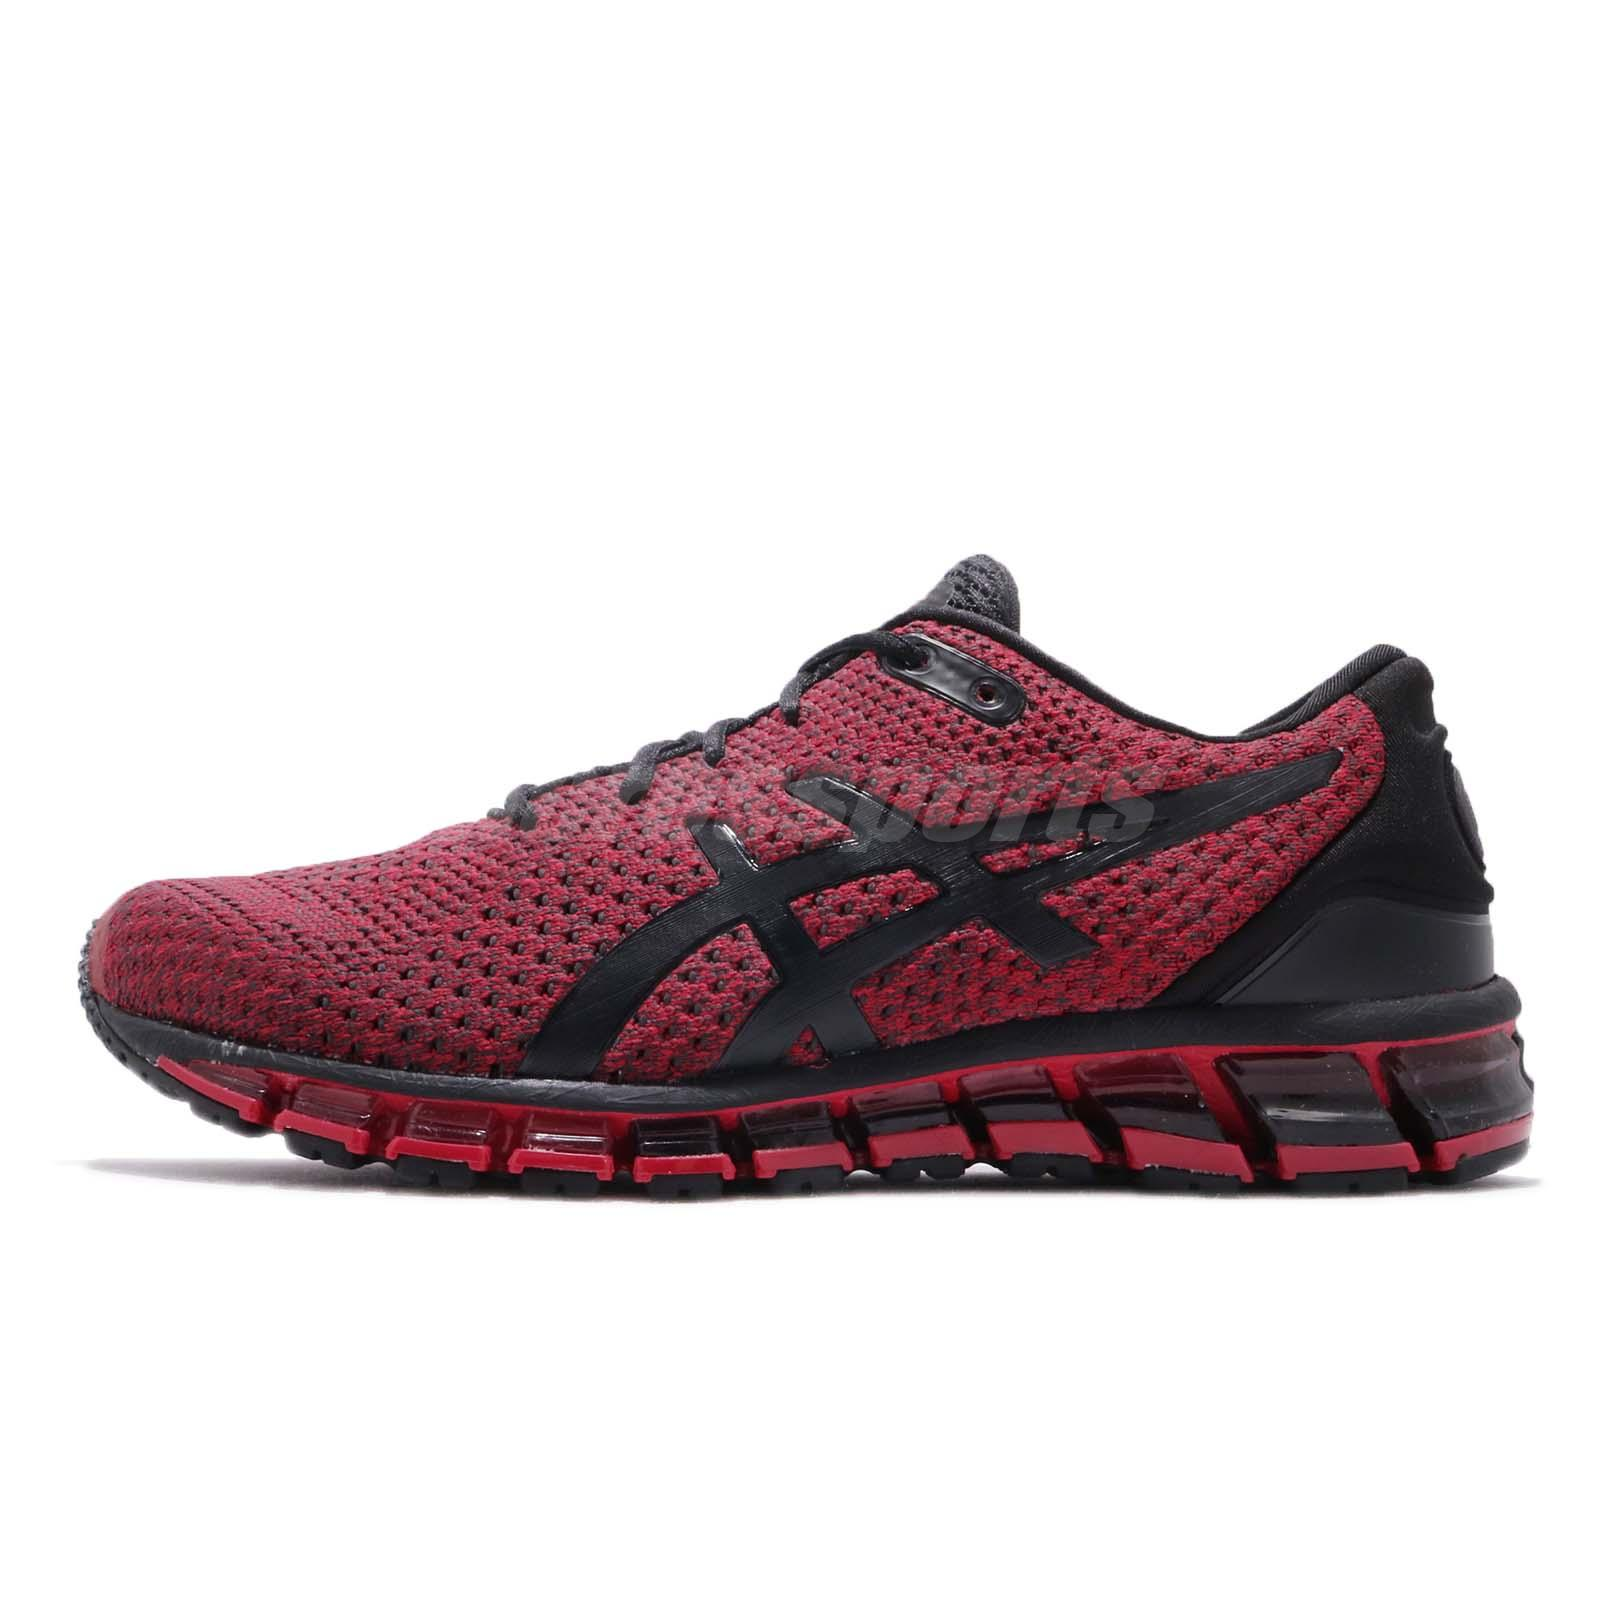 Black Gel-quantum Asics Red Shoes Samba 2 Sur Knit T8g3n-001 Running Détails Men Sneaker 360